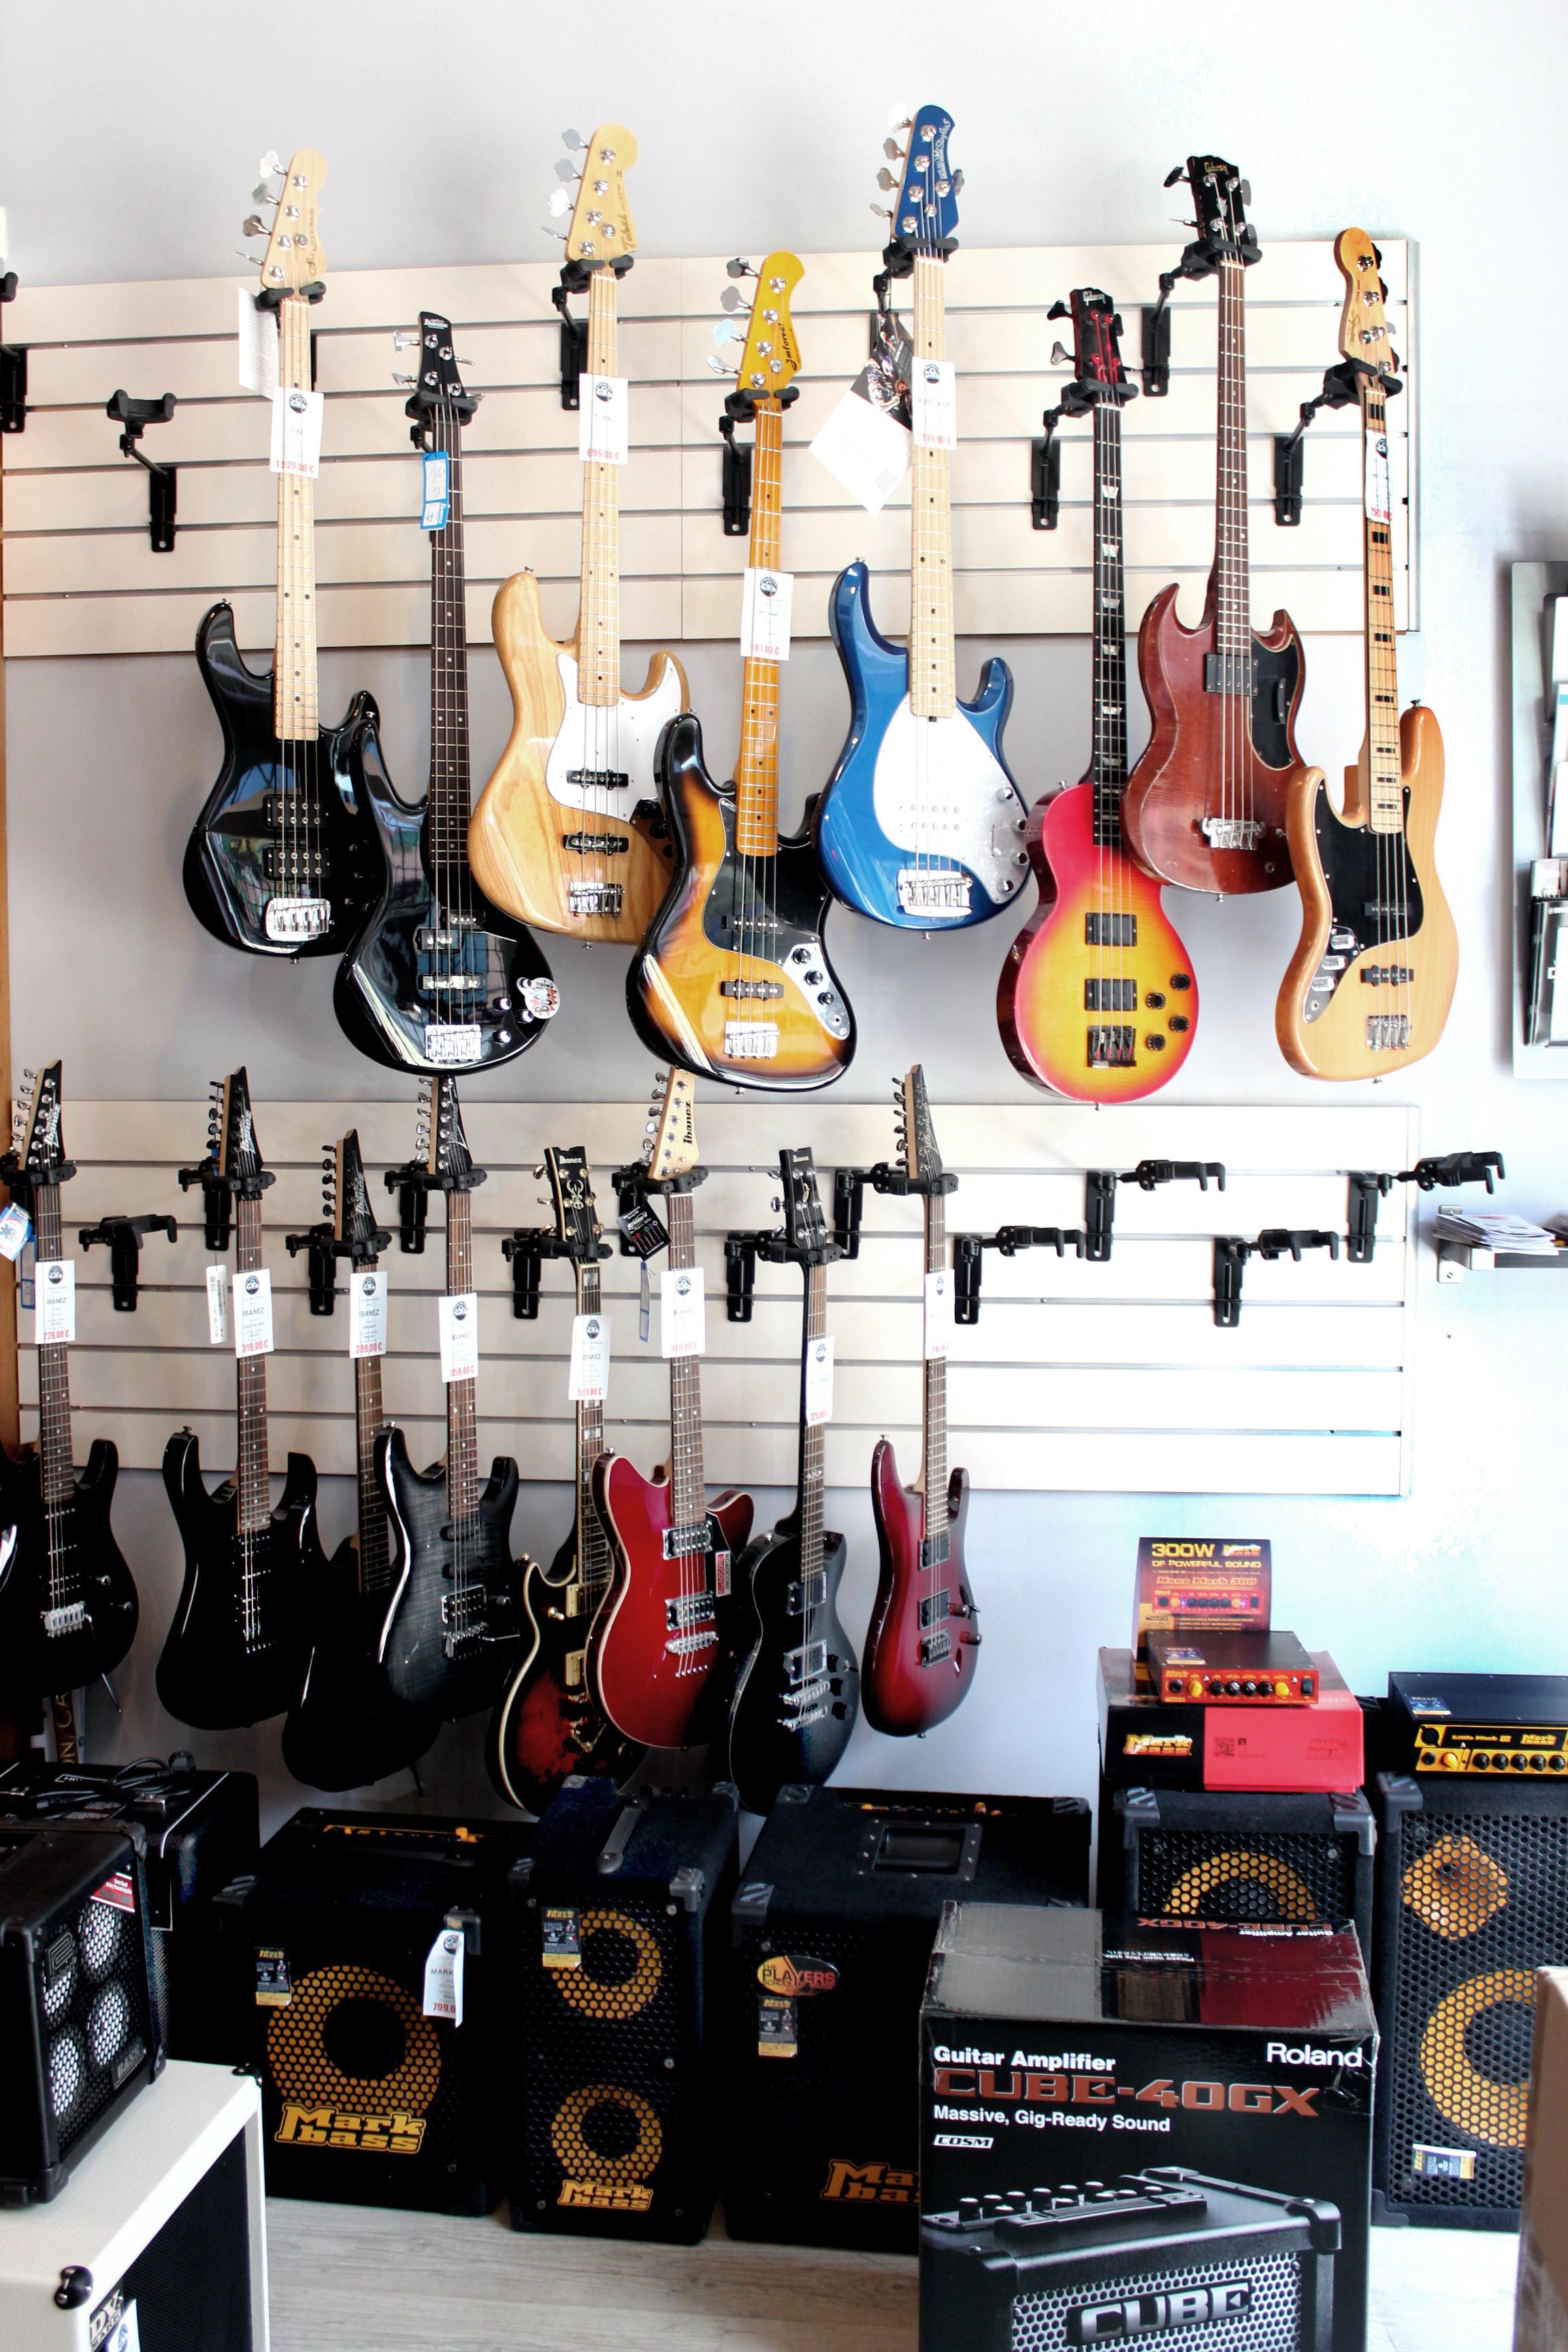 Galerie d'image - Art Rock Music Store